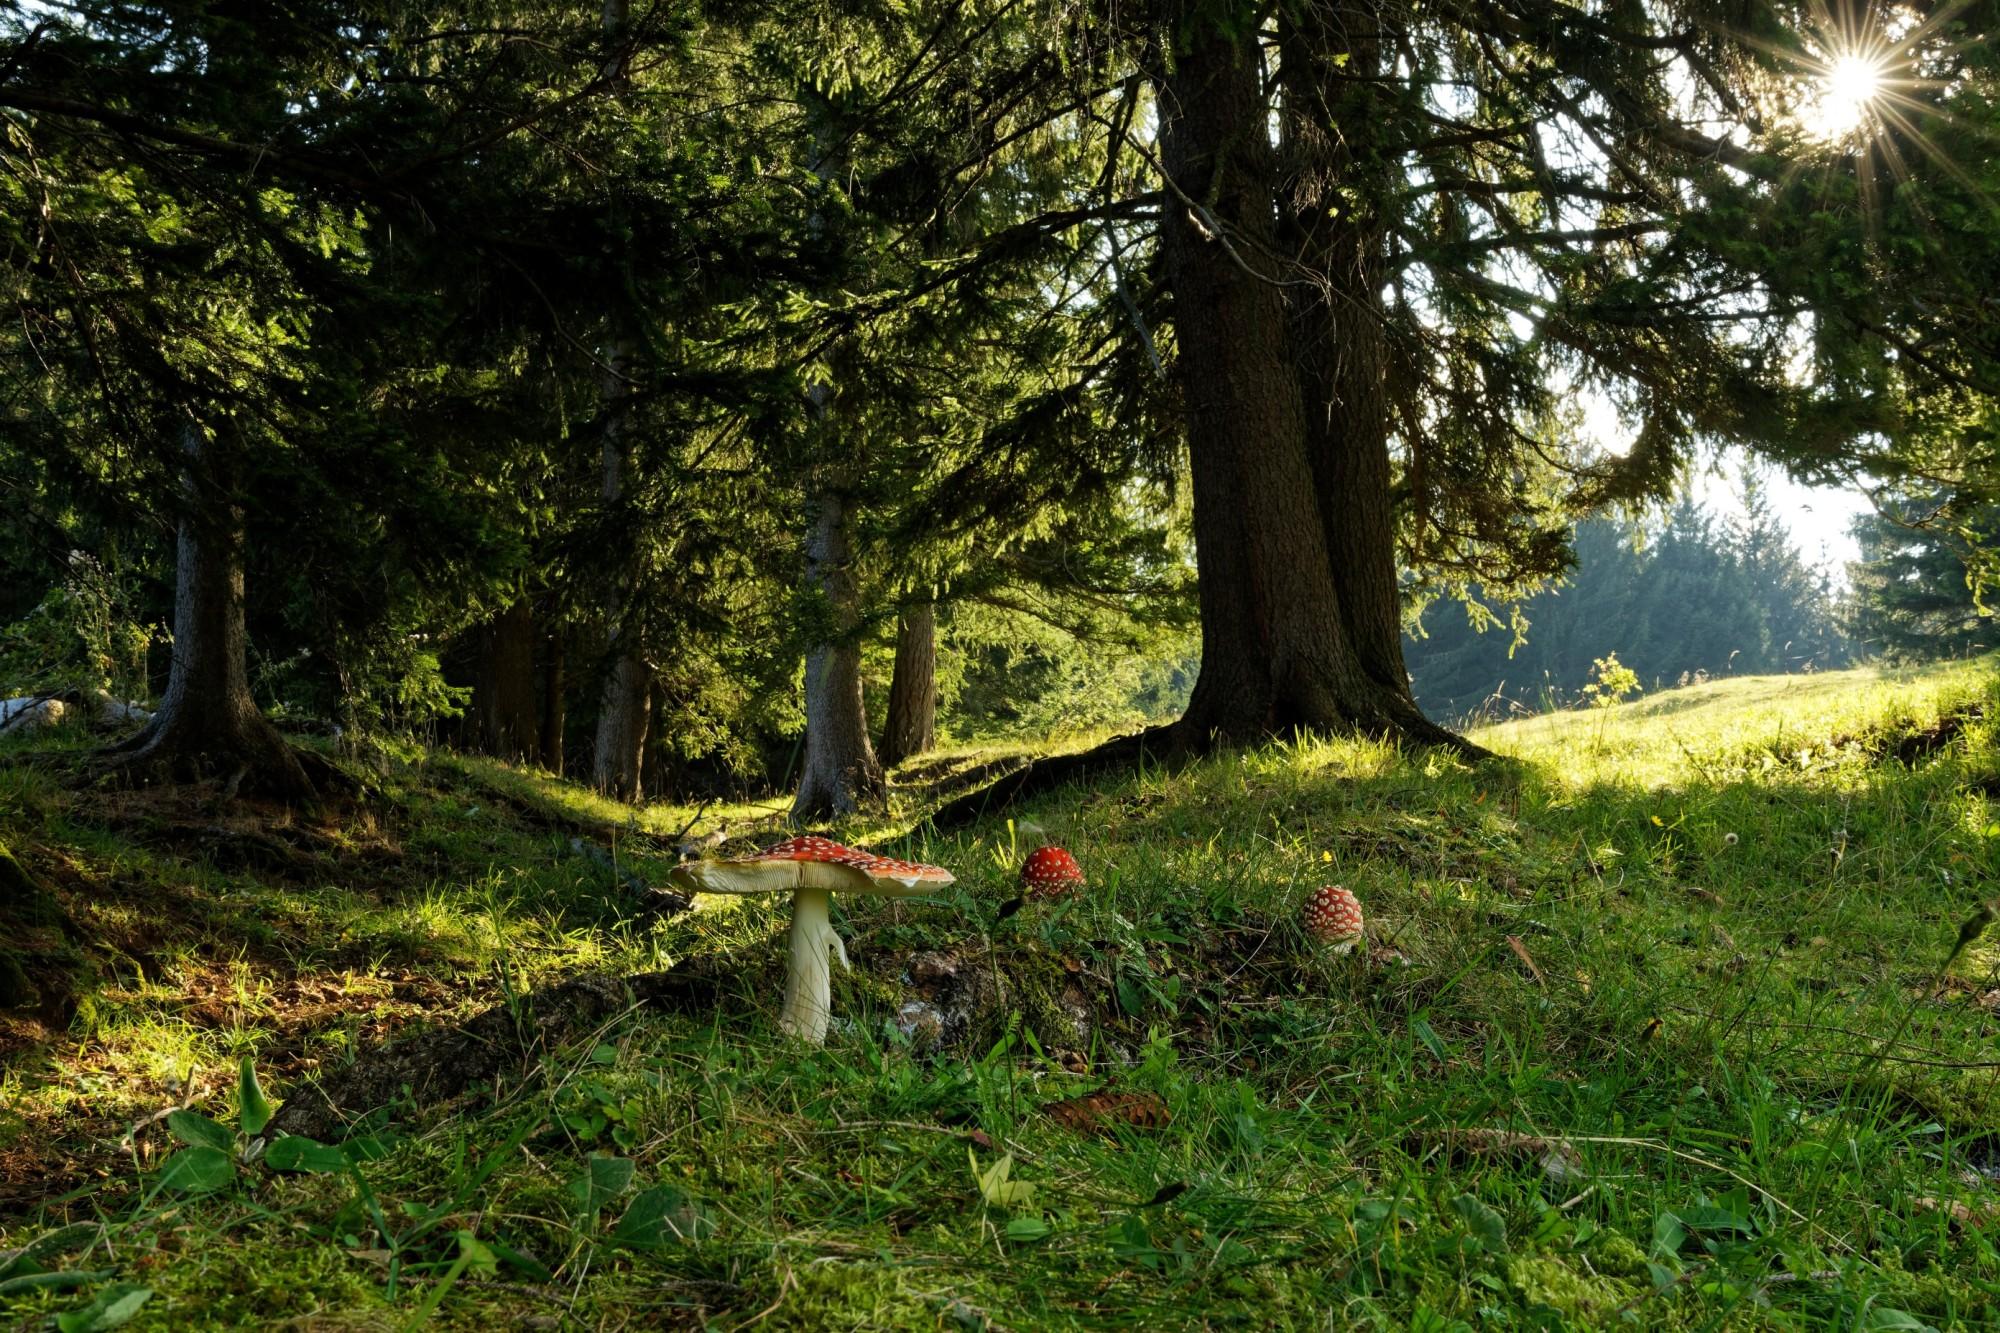 amanita muscaria fliegenpilz im wald 2020-10-09